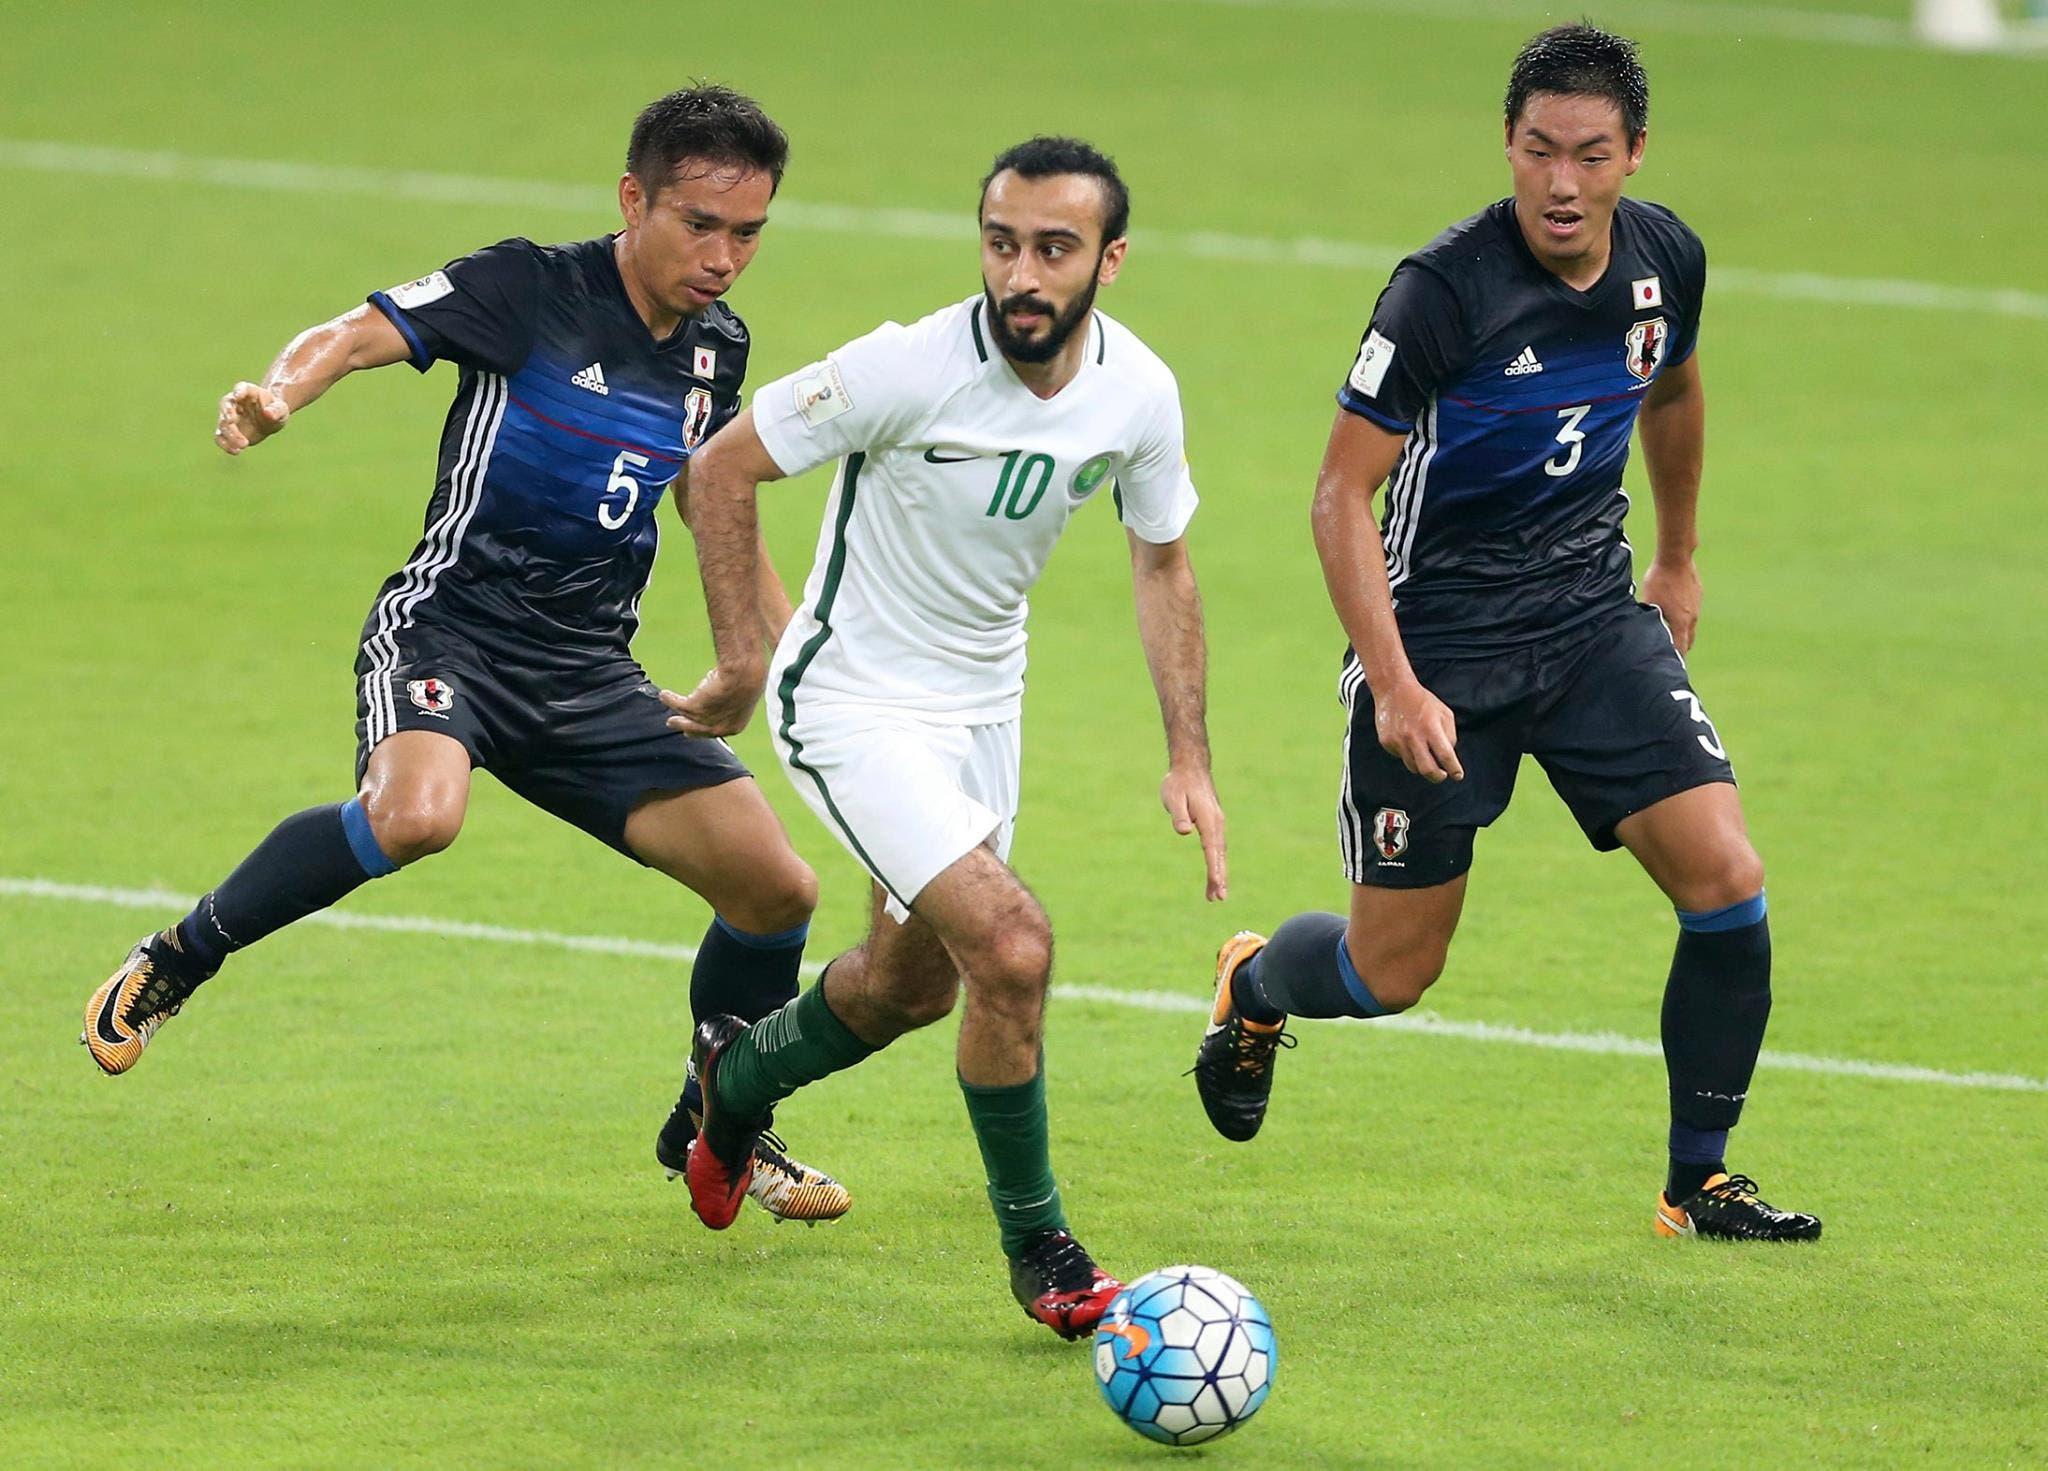 Saudi Arabia's Mohammed Al Sahlawi, center, runs with the ball against Japan's Yuto Nagatomo, left, and Japan's Gen Shoji. (AP)